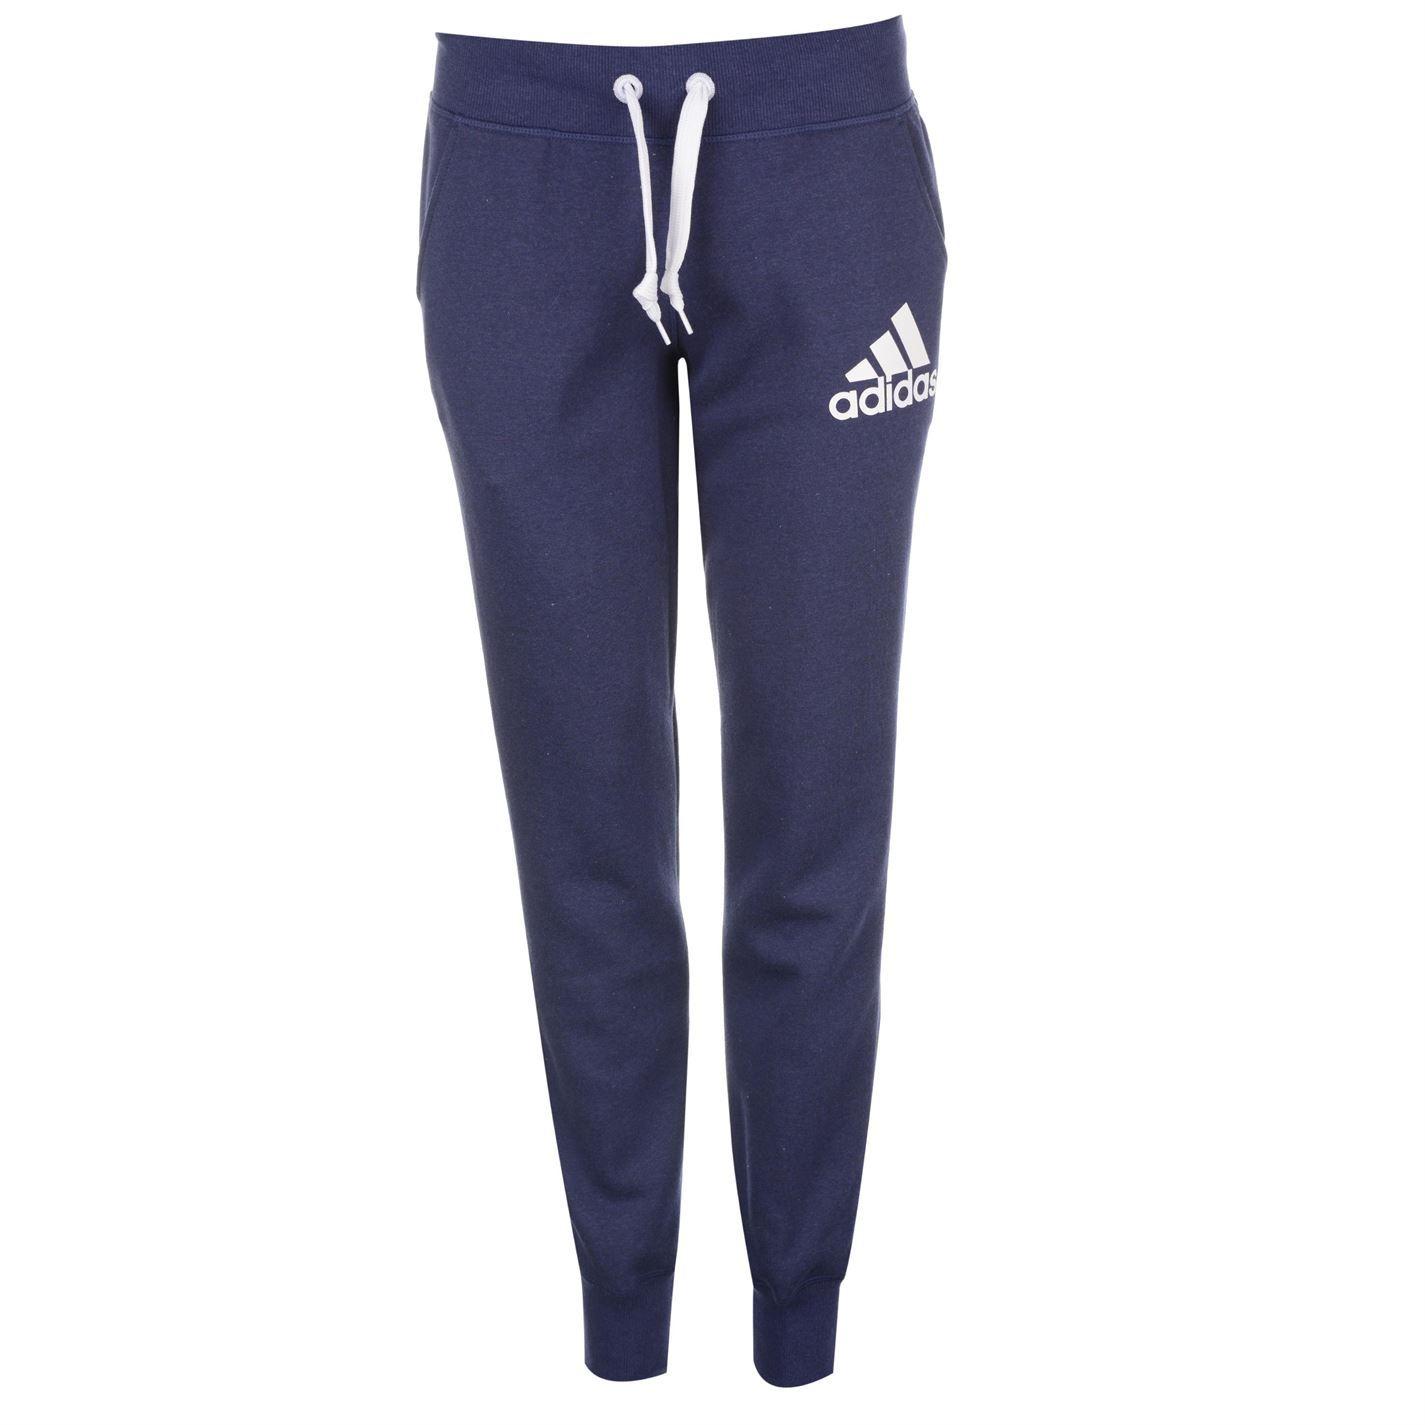 Fantastic Home Adidas Performance Jogging Pants